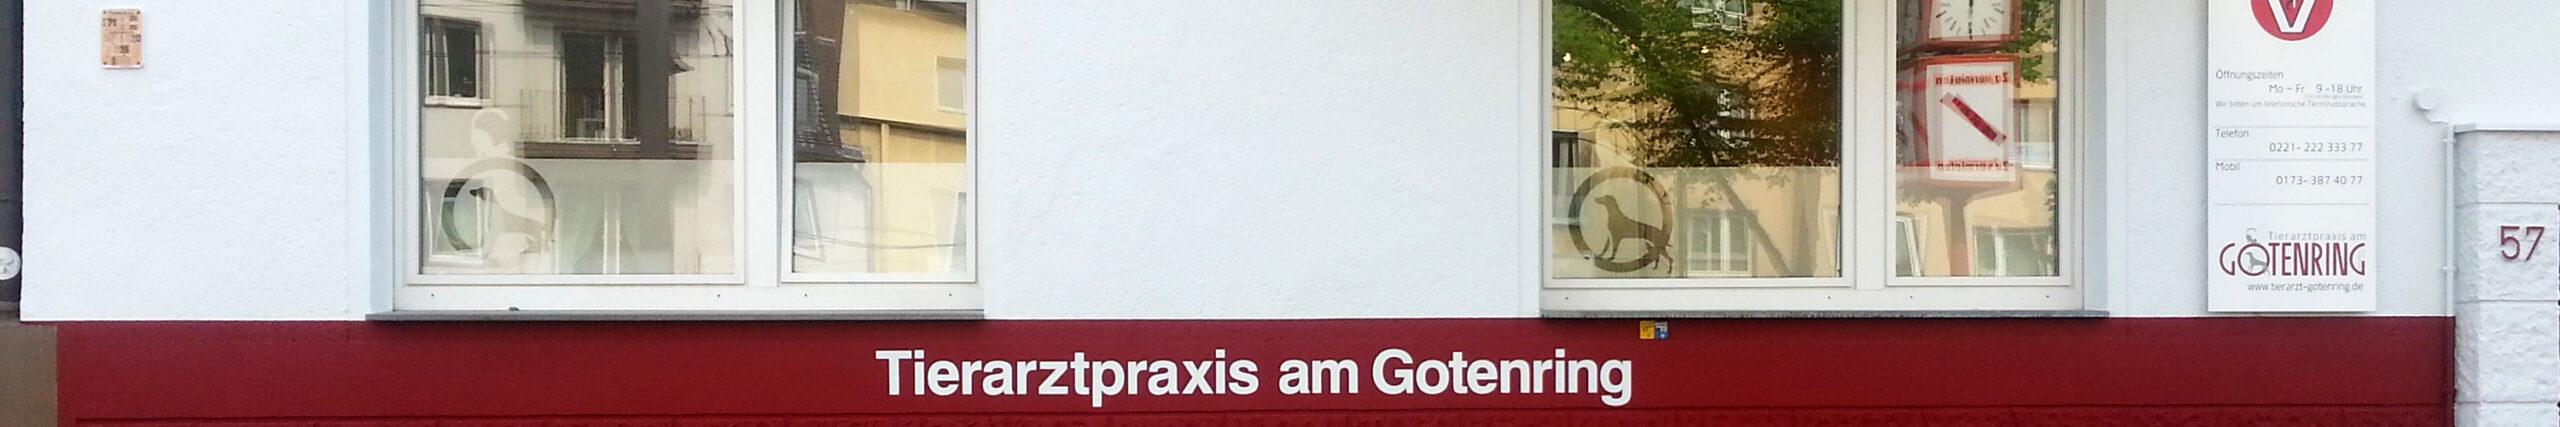 Tierarztpraxis am Gotenring, Köln - Team